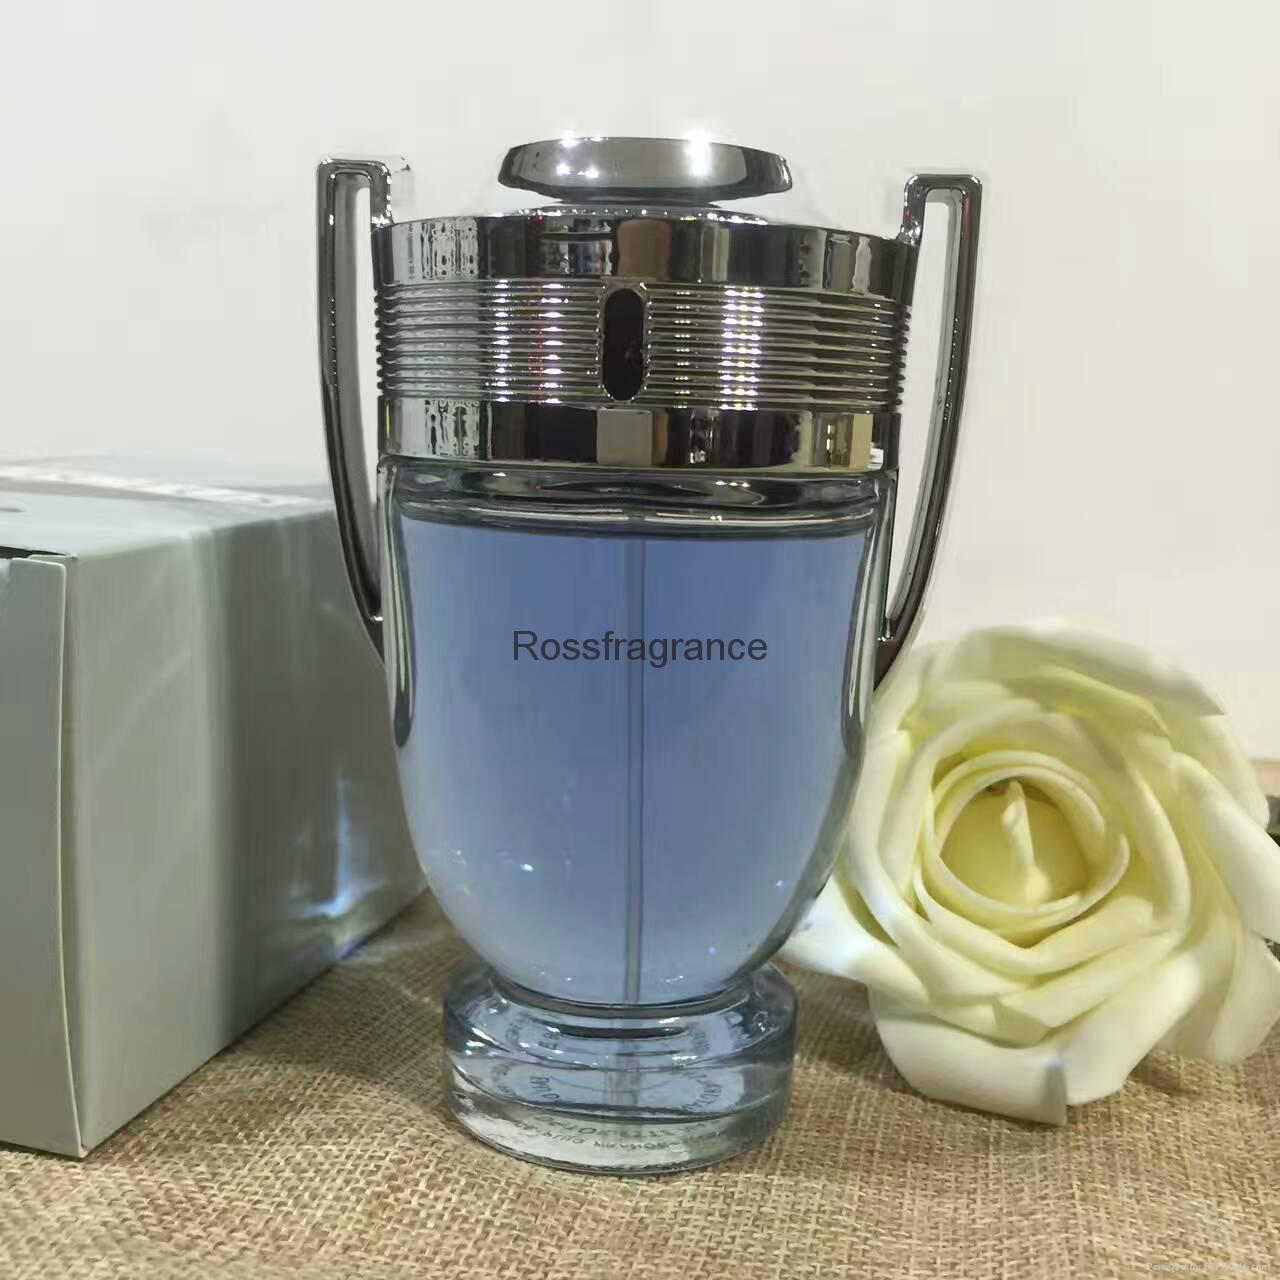 Brand cologne Gentlemen perfume invictus for men